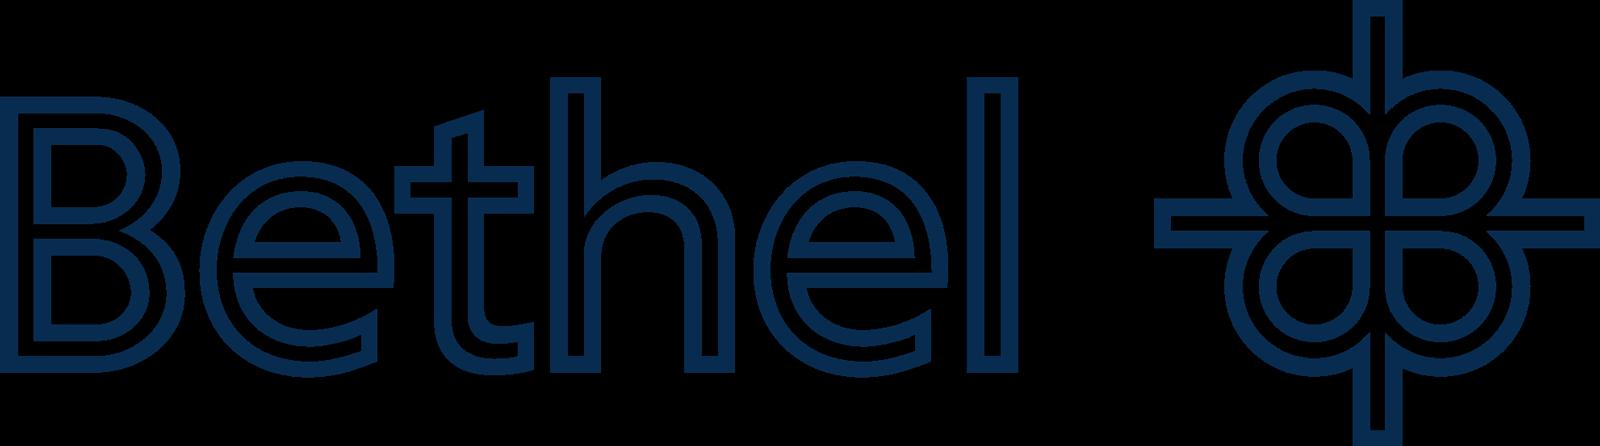 Stiftung Bethel DLZ